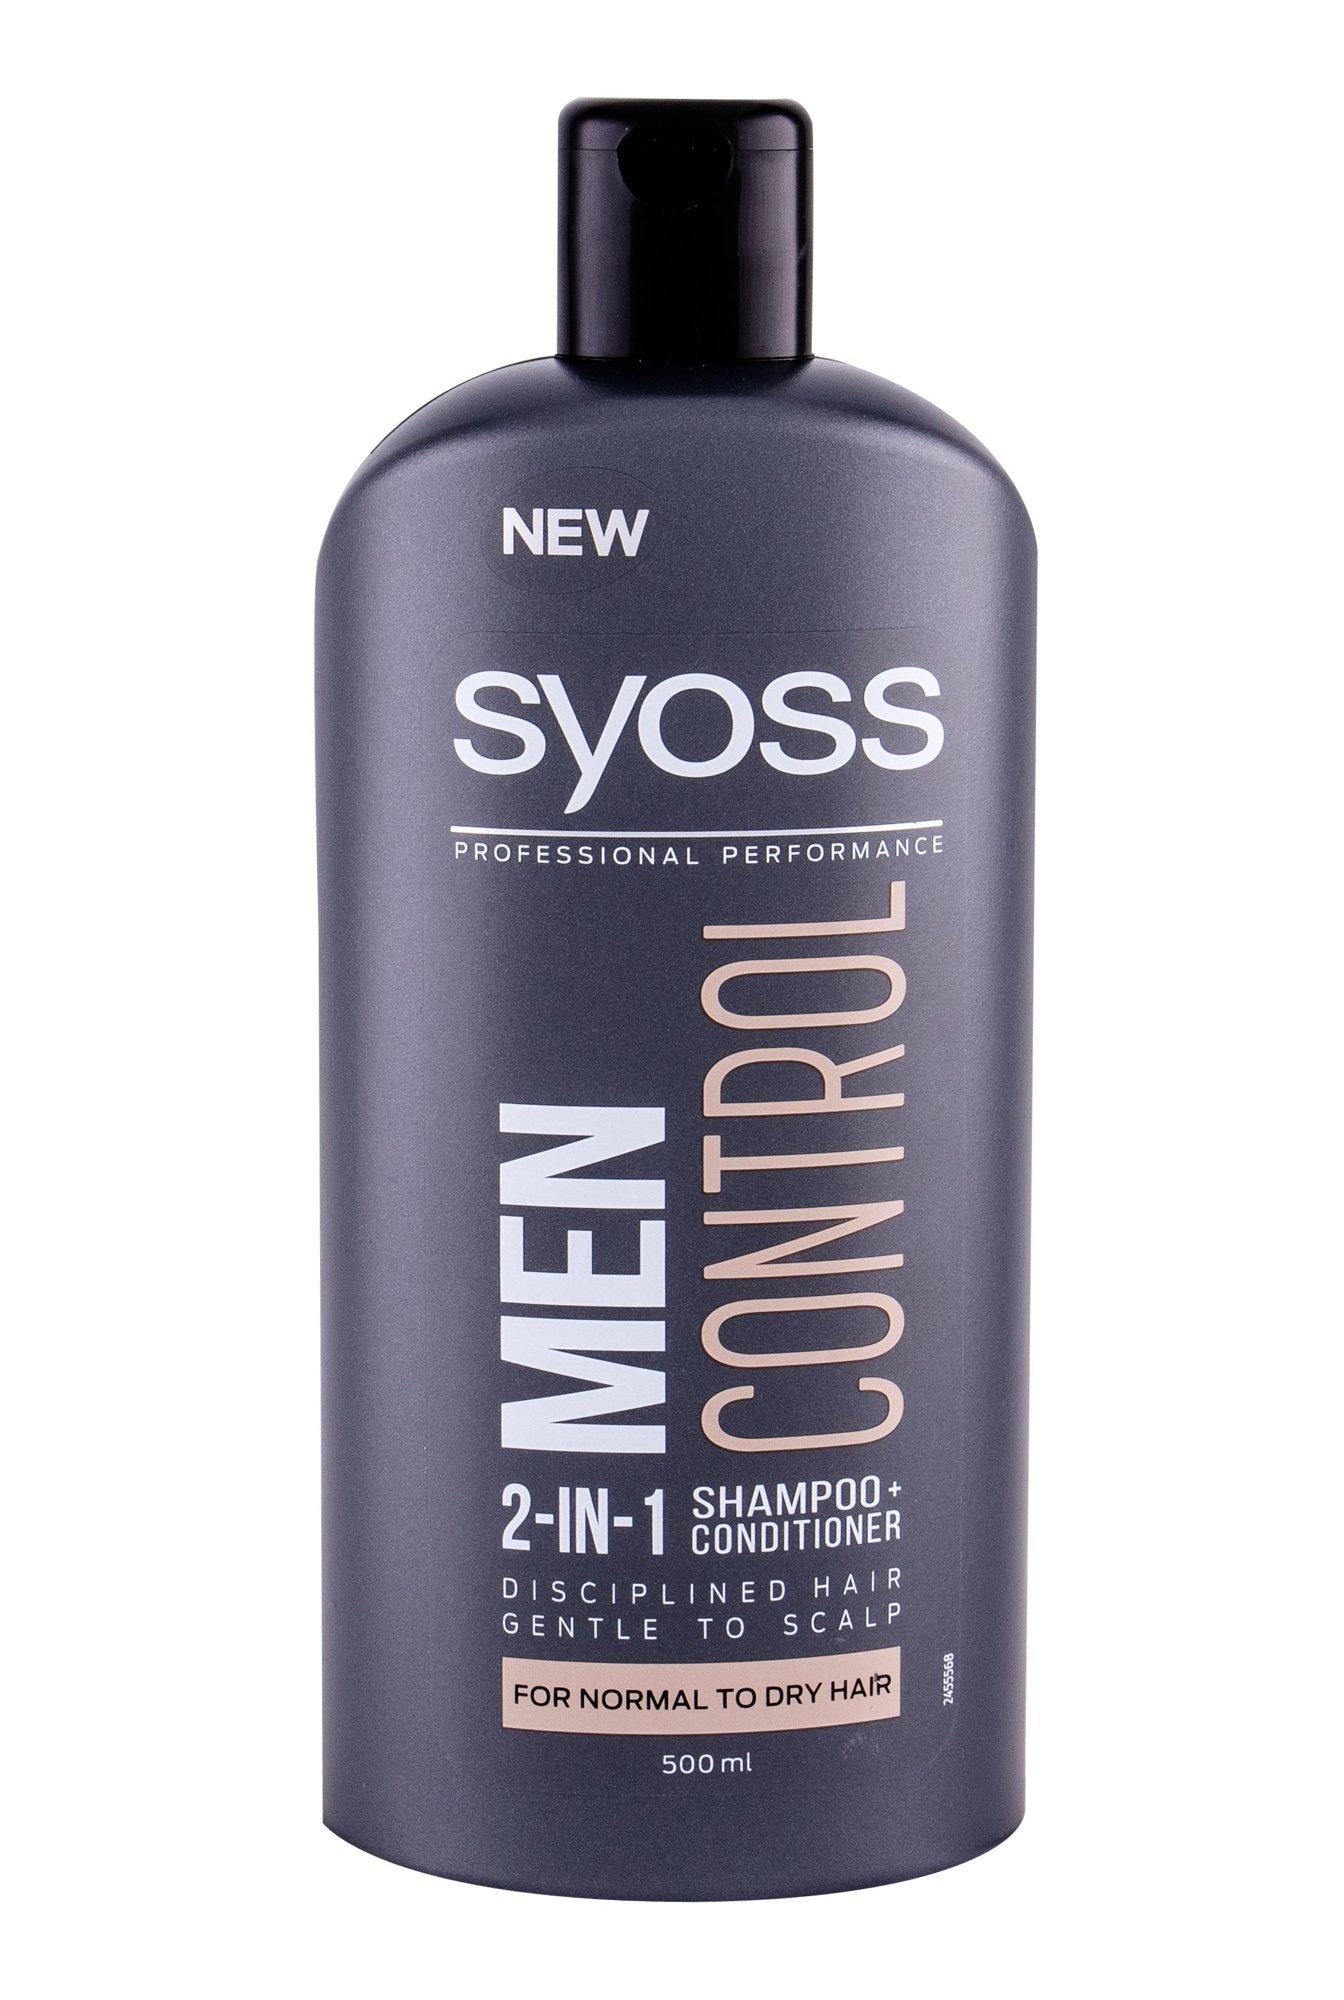 Syoss Professional Performance Men Shampoo 500ml  Control 2-in-1